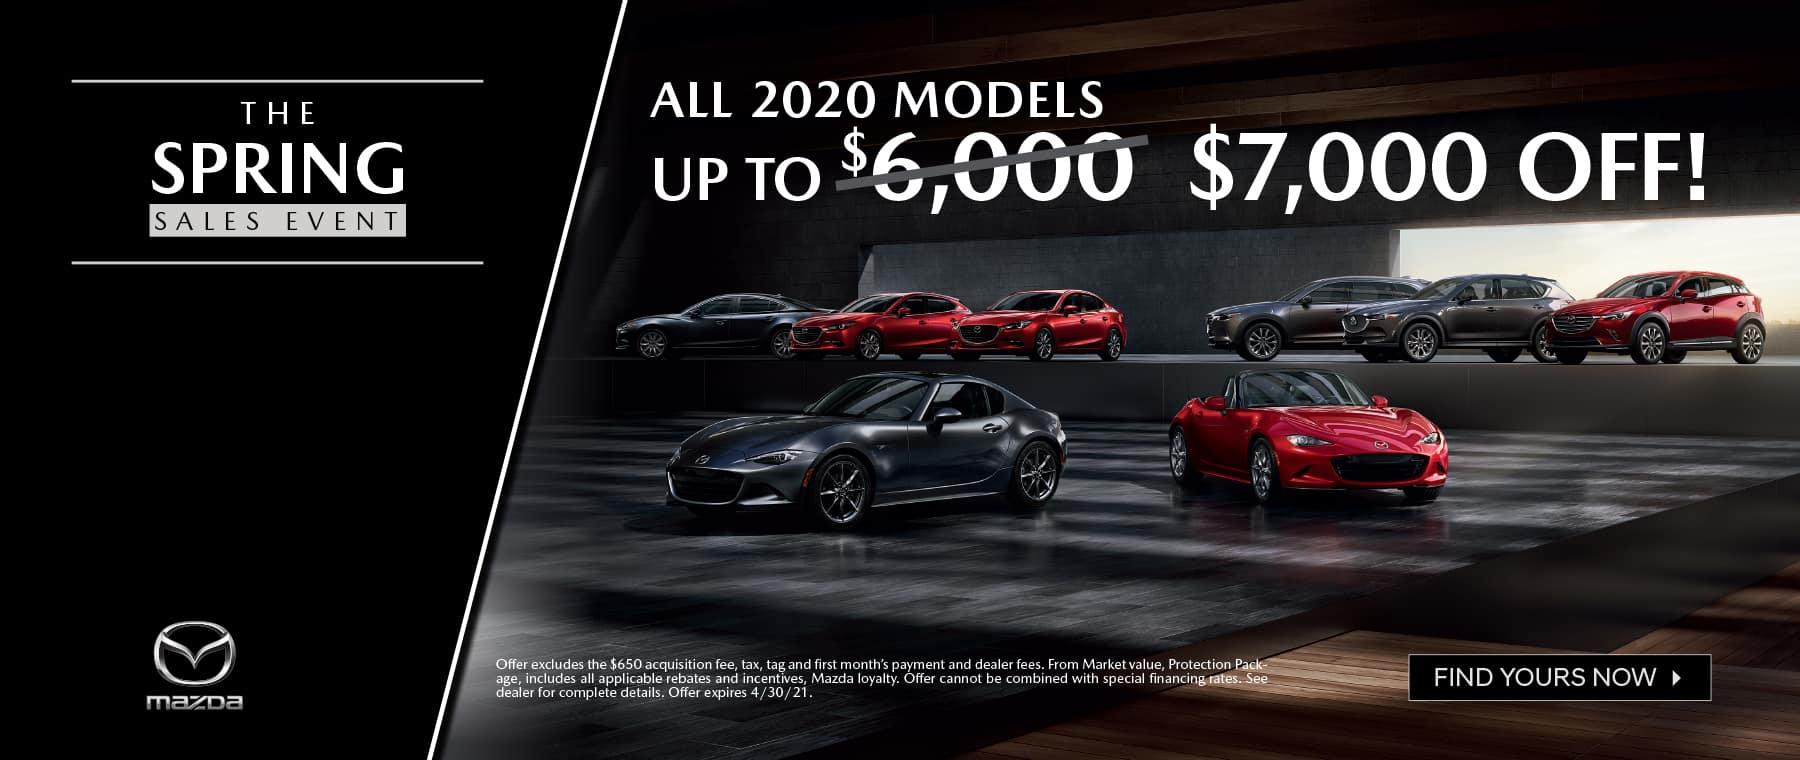 2021.03.26-Keffer-Mazda-APR-Web-Banners-S51614vw-2